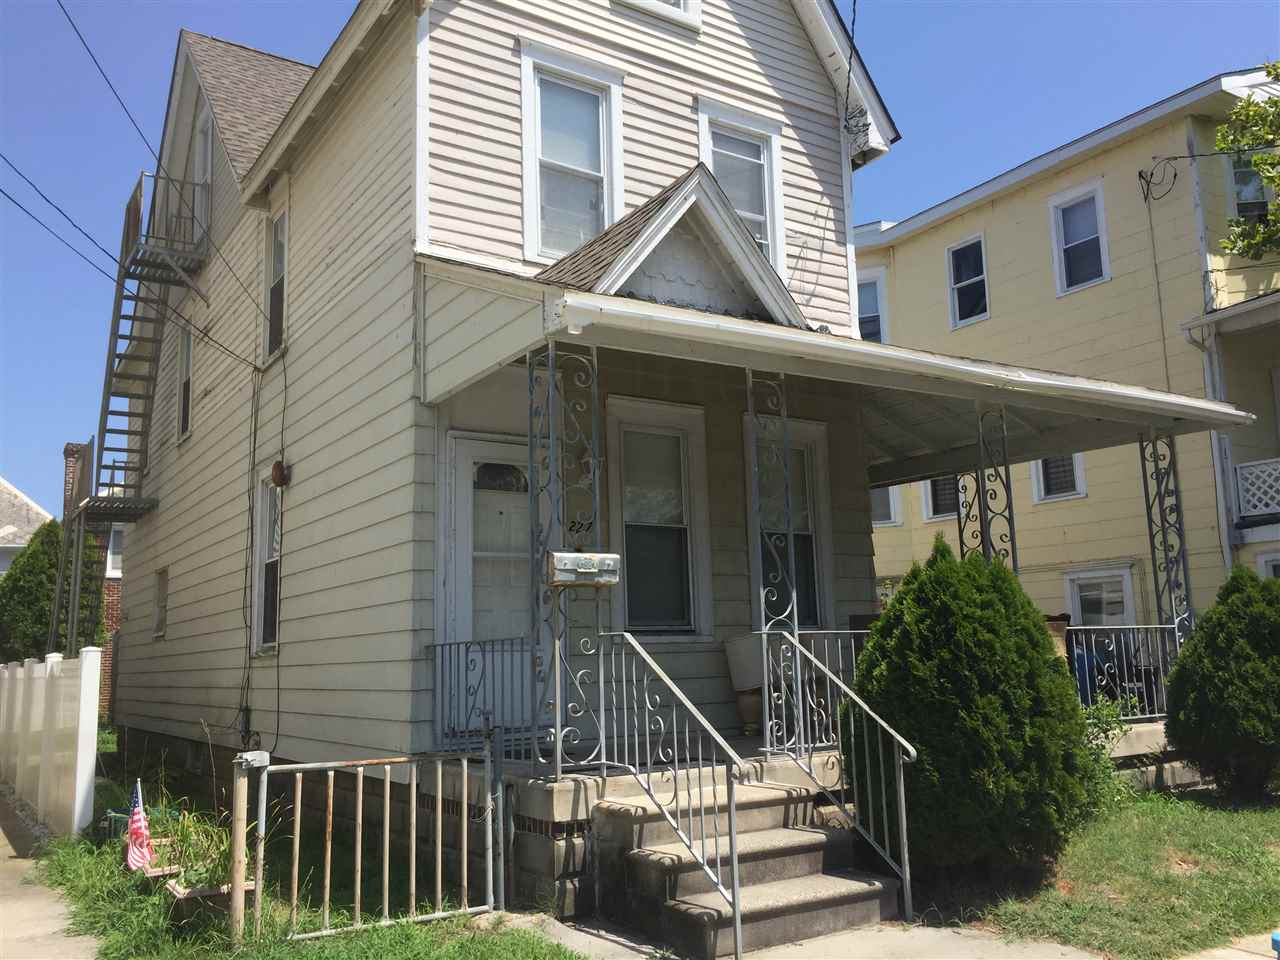 227 E Maple, Wildwood, NJ 08260